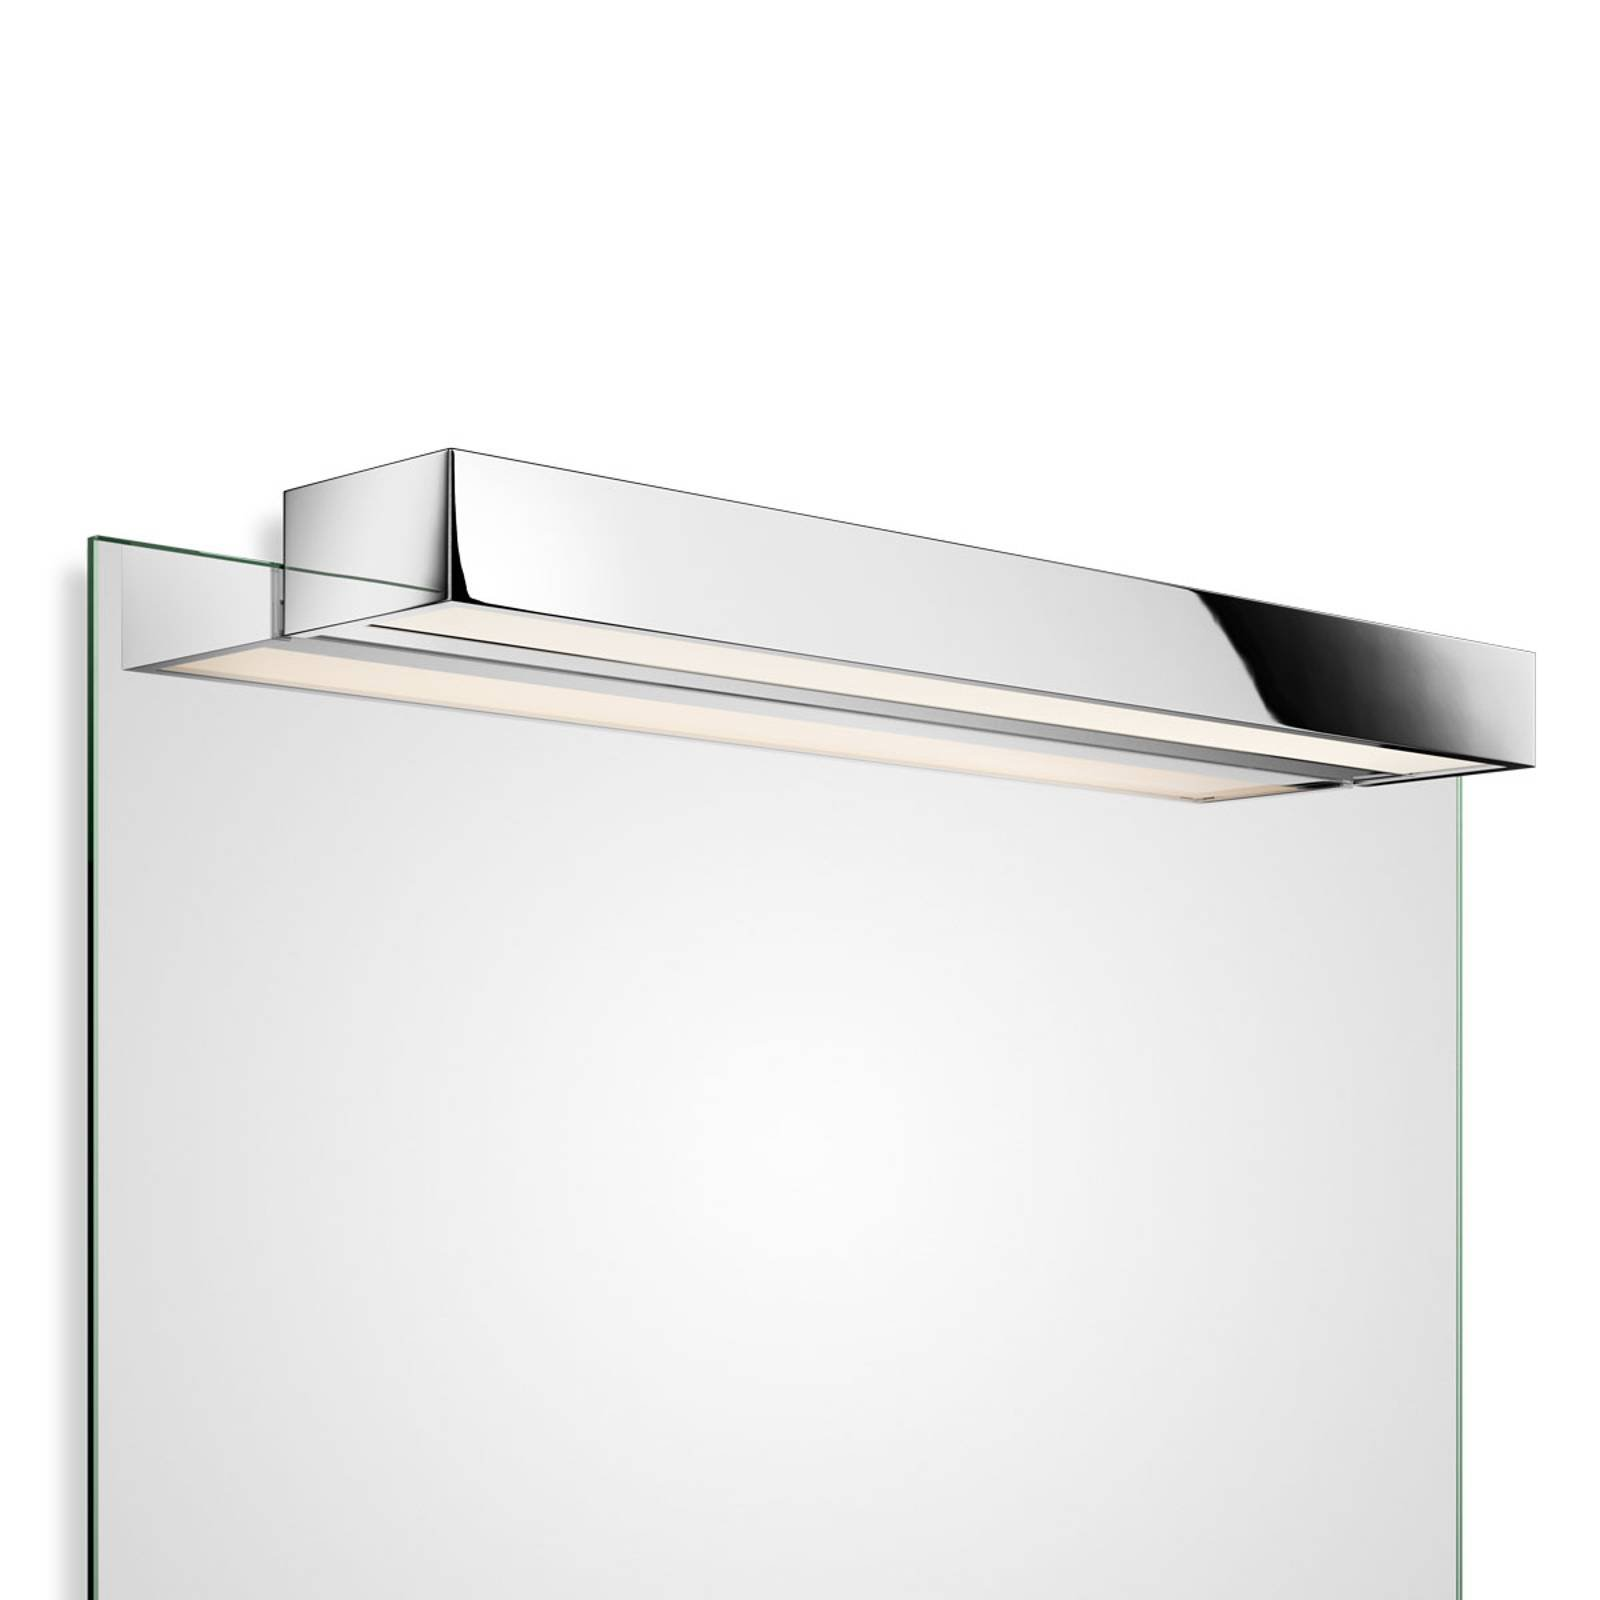 Decor Walther-boks 1-60 N LED-speillampe 3 000 K